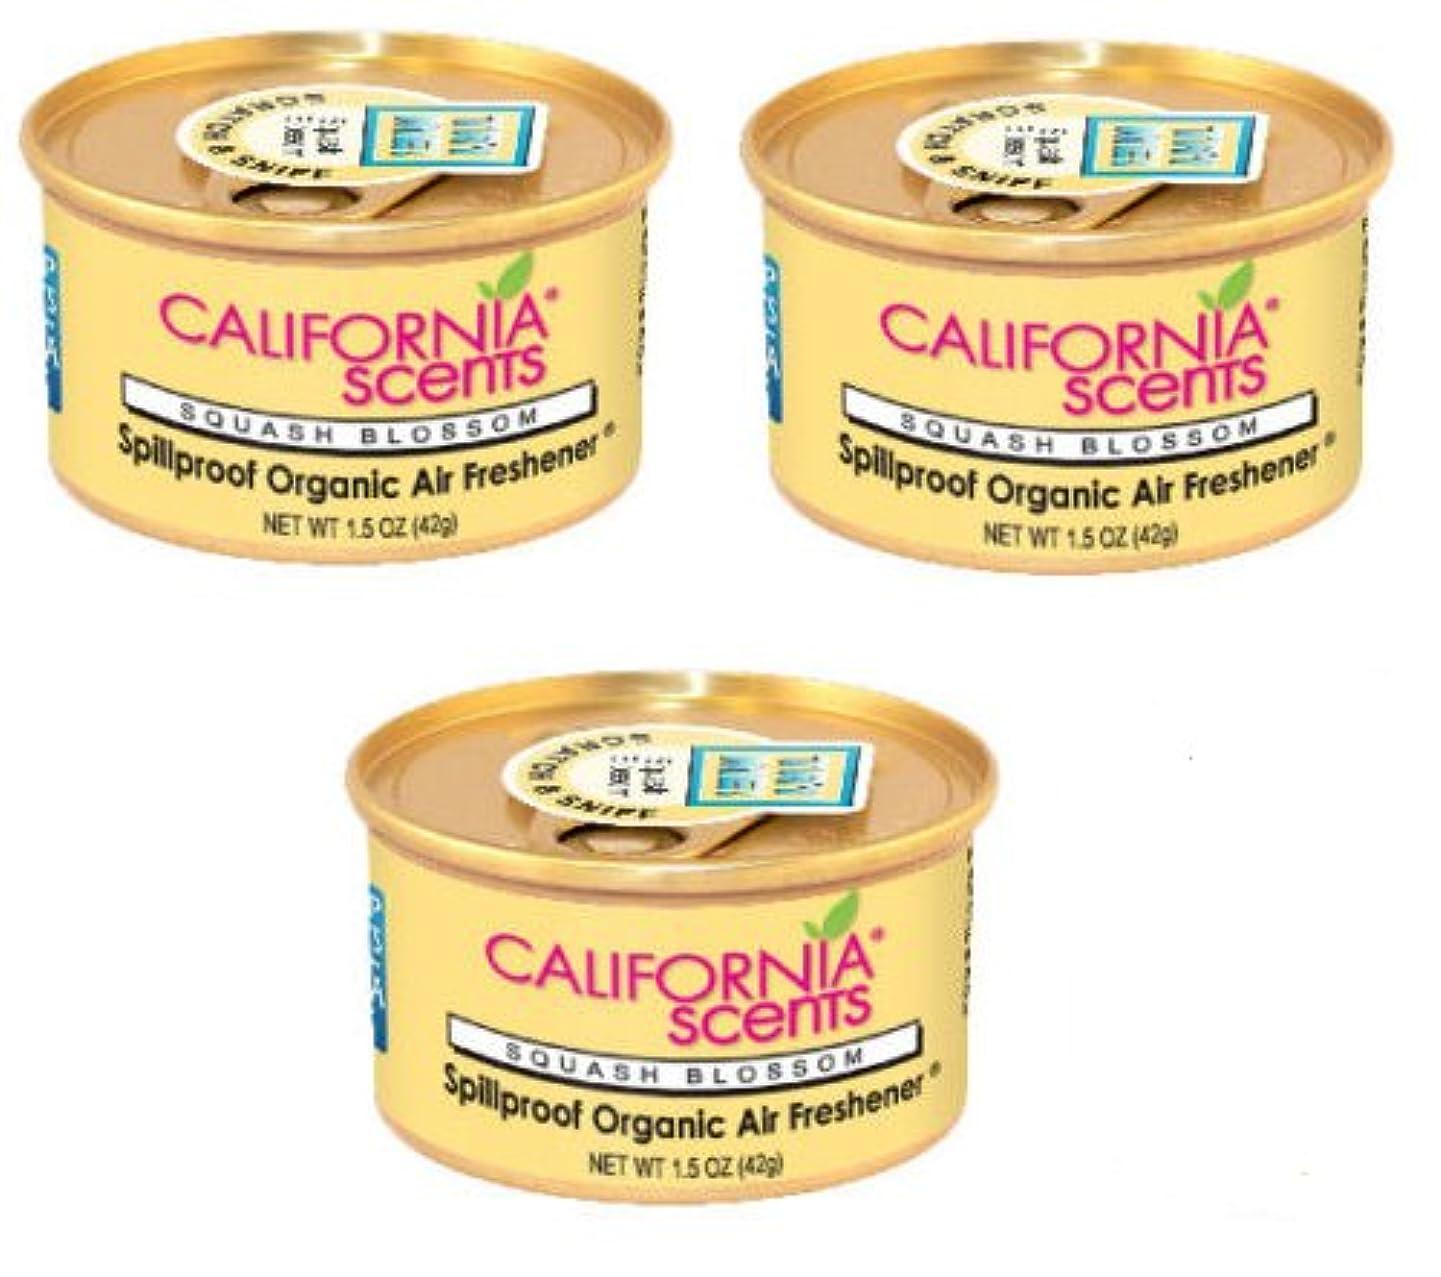 California Scents Air Freshener NEW SCENTS!! SET OF 3 (SQUASH BLOSSOM)